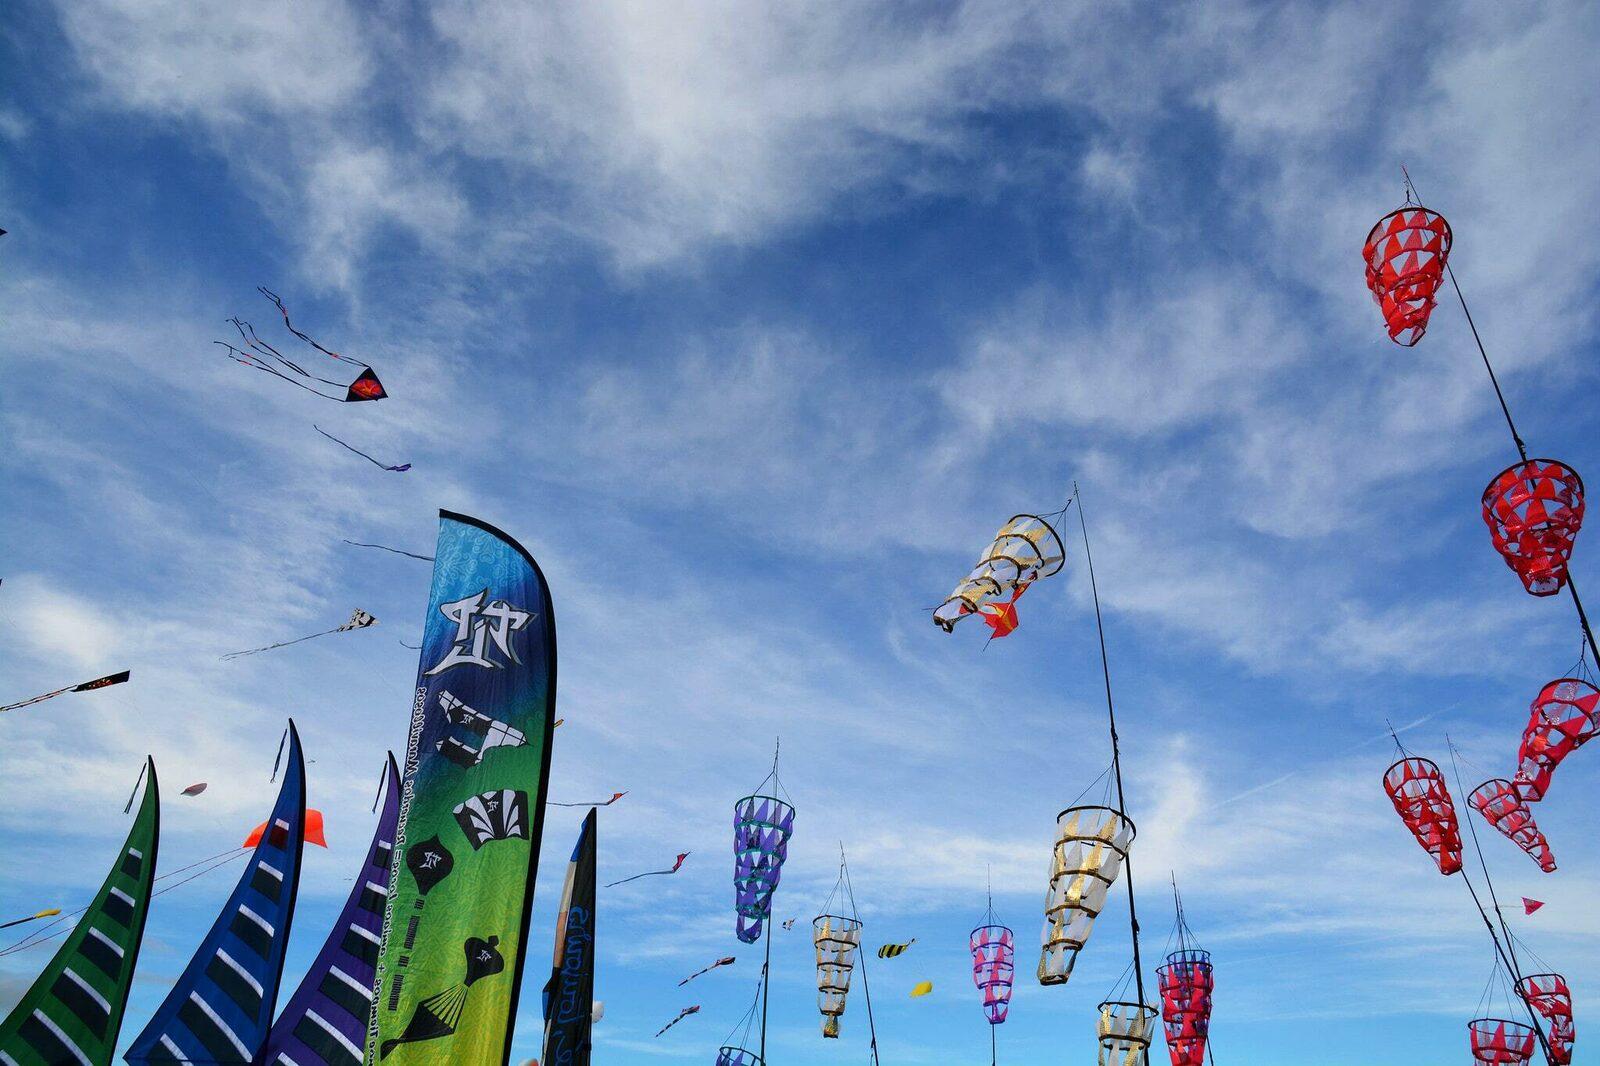 Festival du Cerf Volant de Fréjus